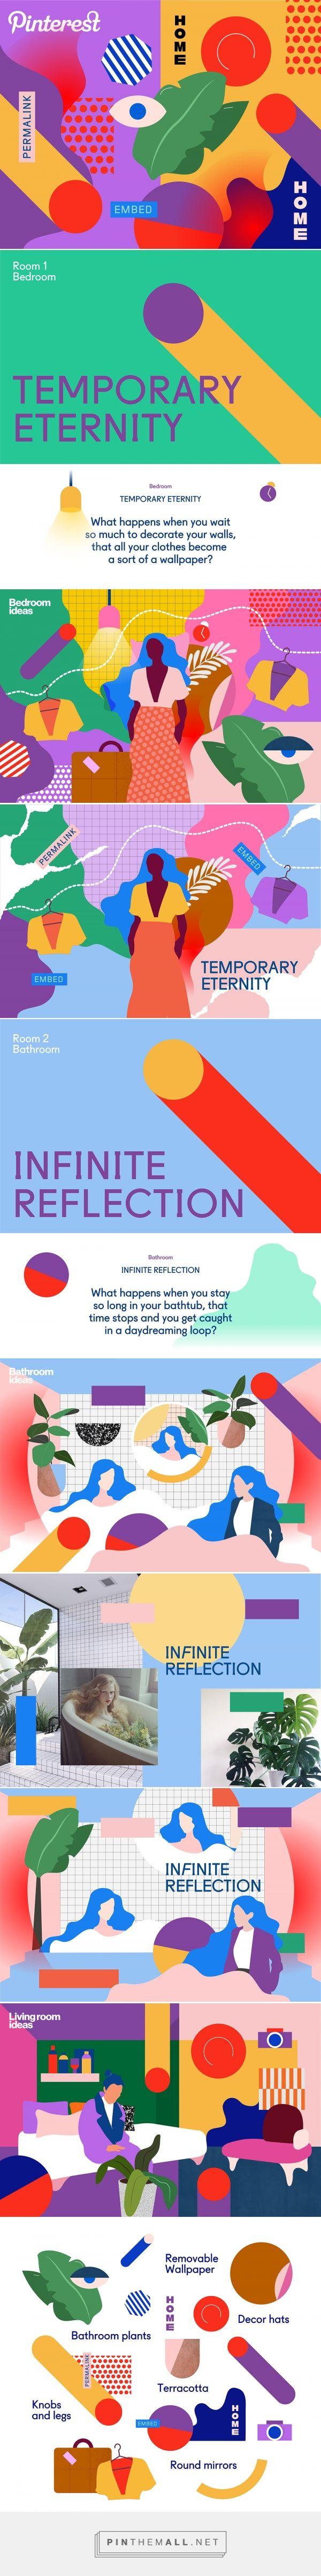 Pinterest Home Trends 2017 Illustrations on Behance - created via https://pinthemall.net